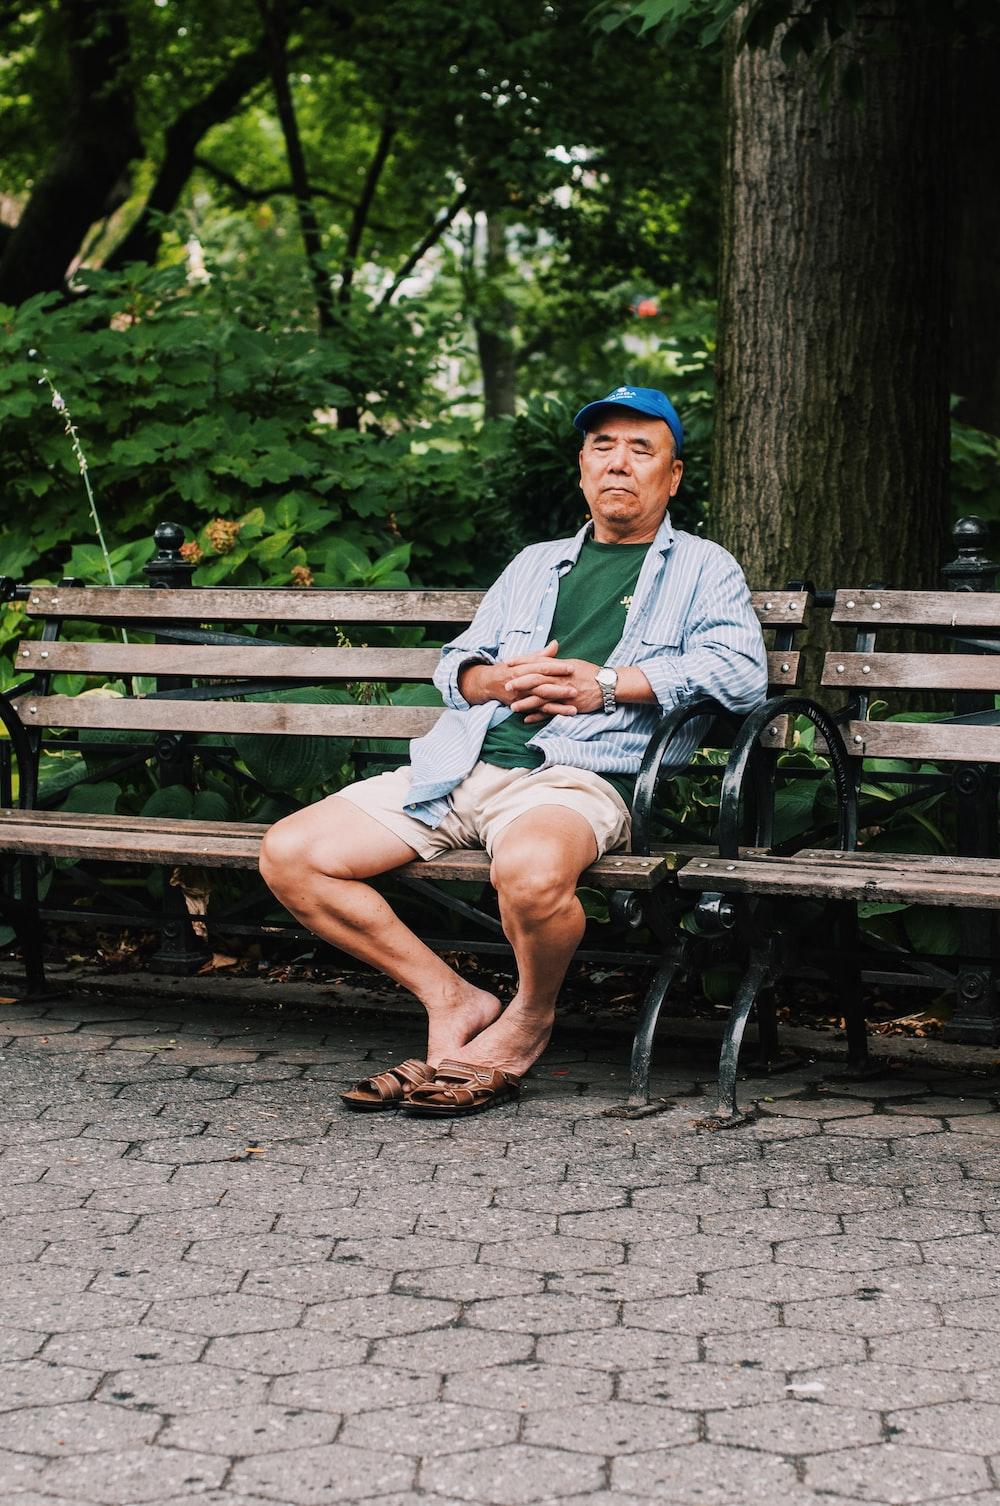 man sitting on bench closing his eyes near trees